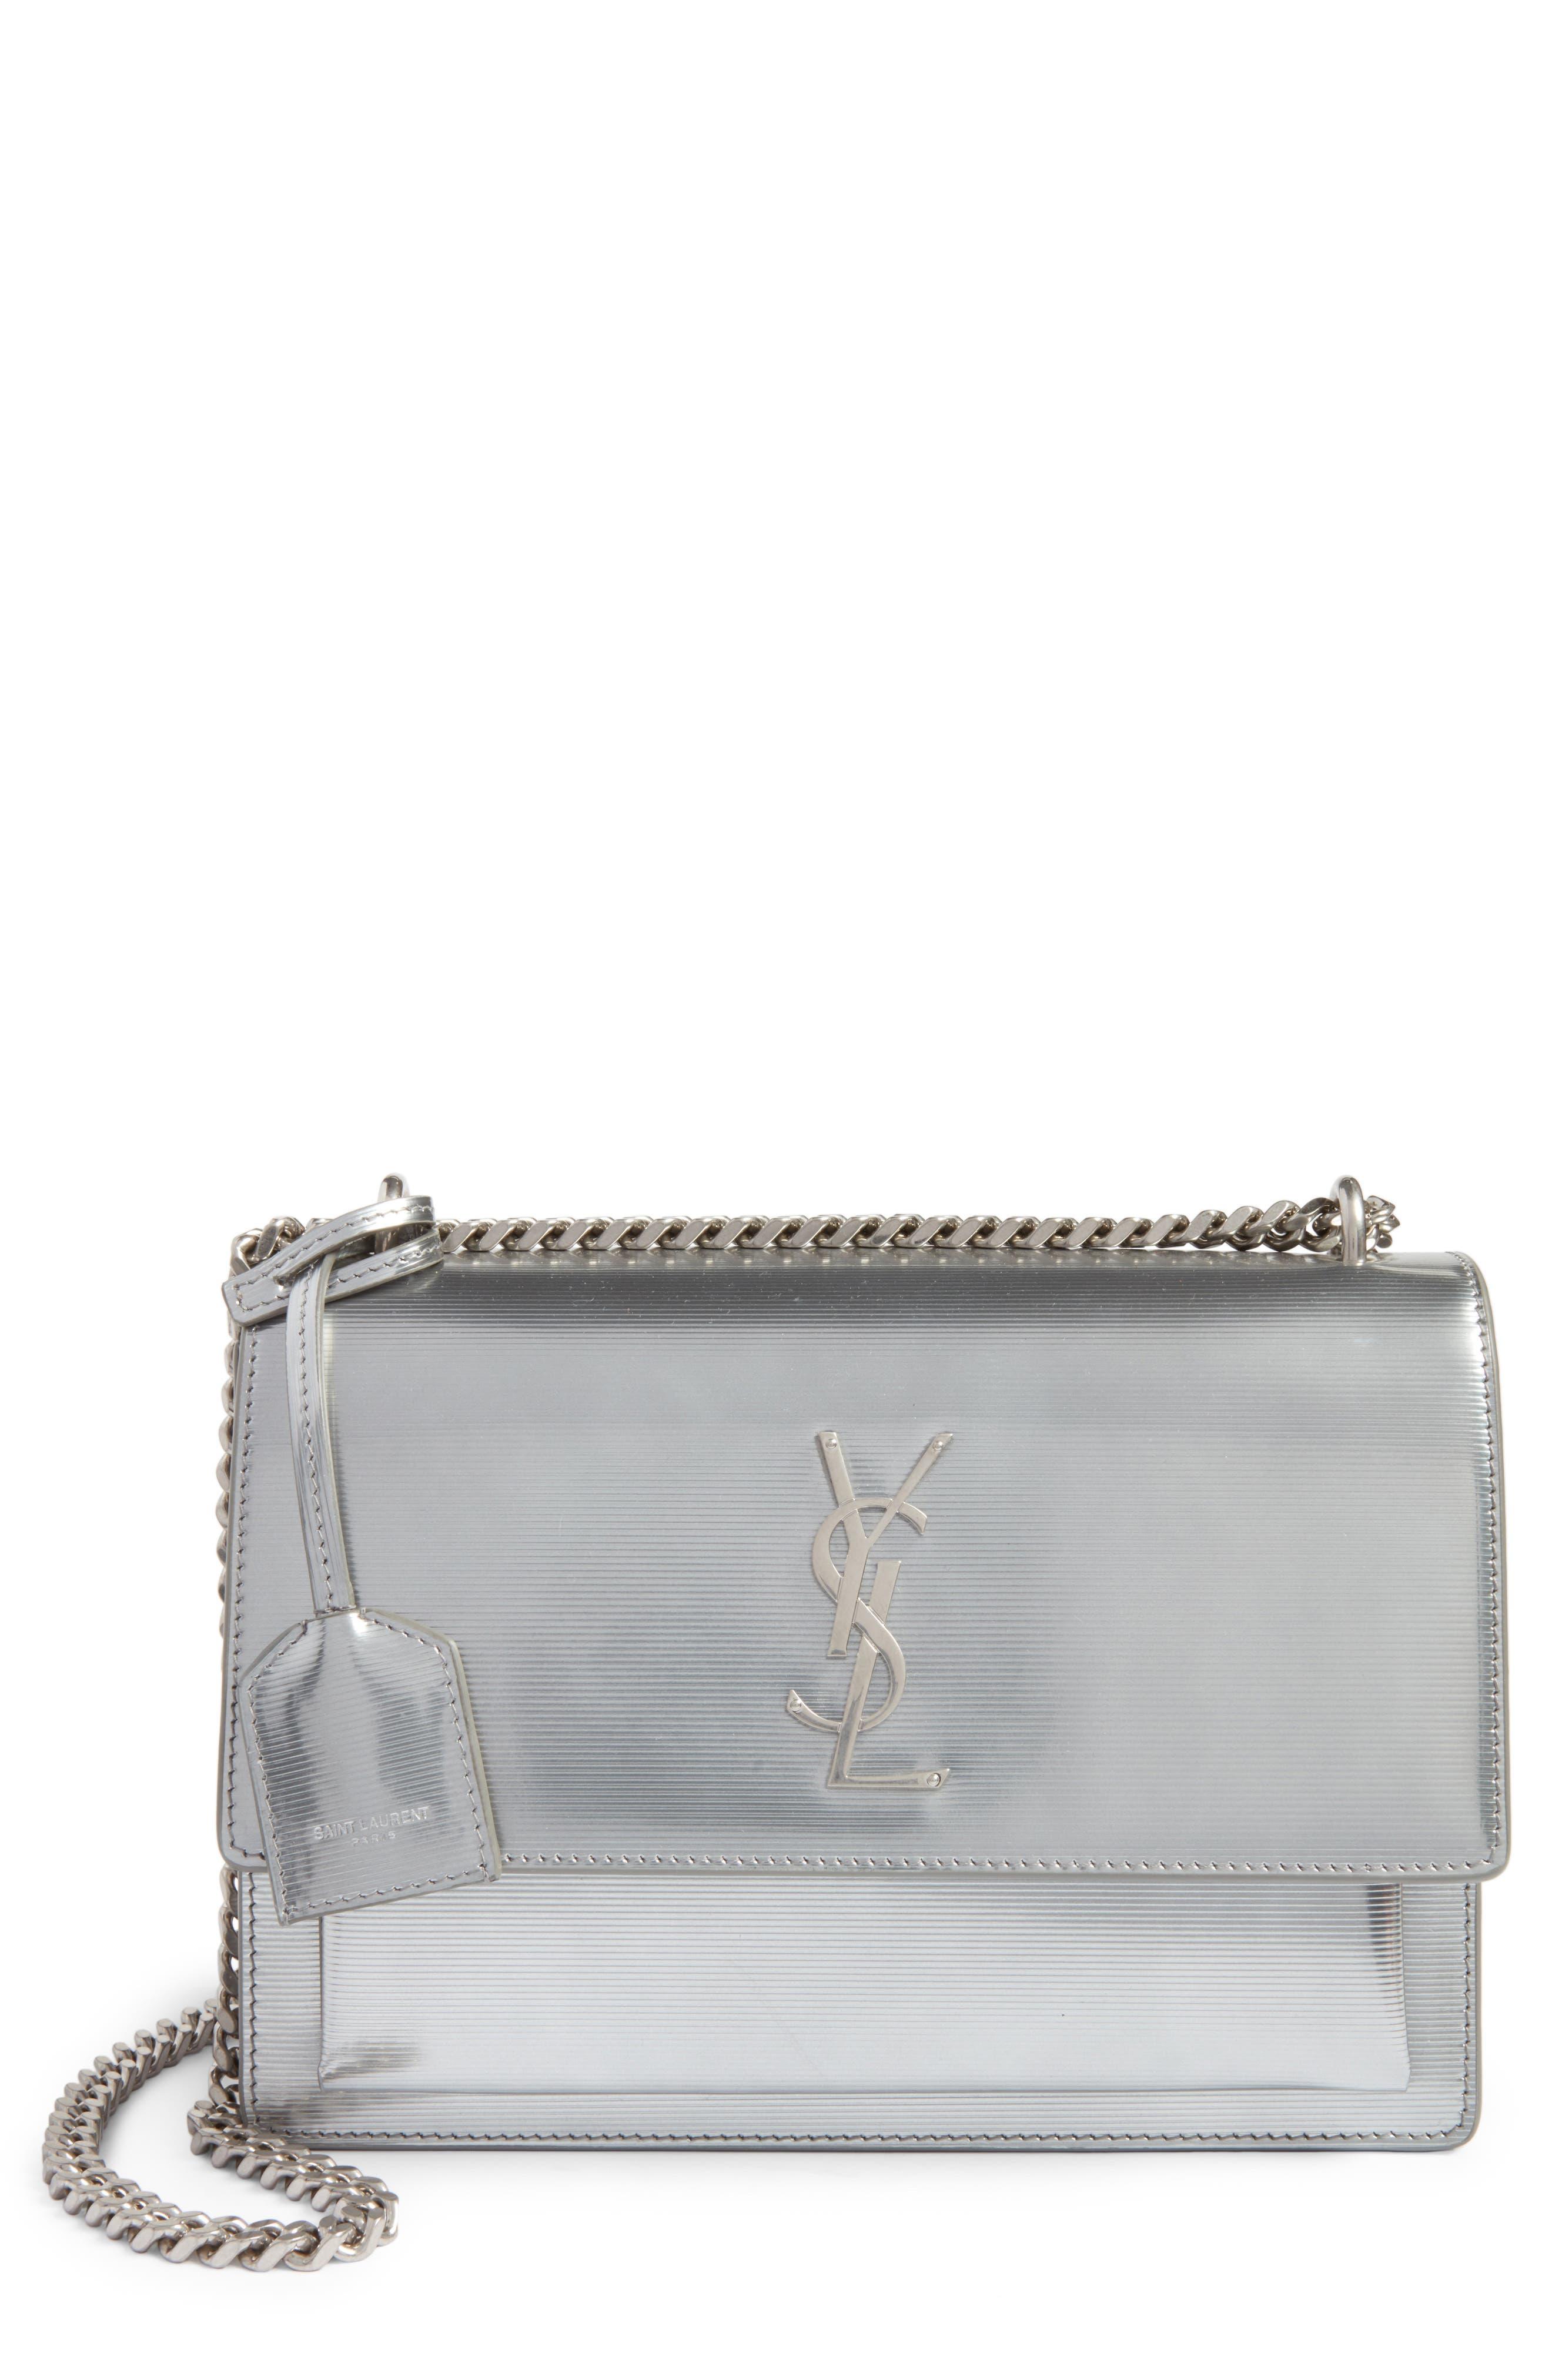 Alternate Image 1 Selected - Saint Laurent Medium Sunset Opium Leather Crossbody Bag